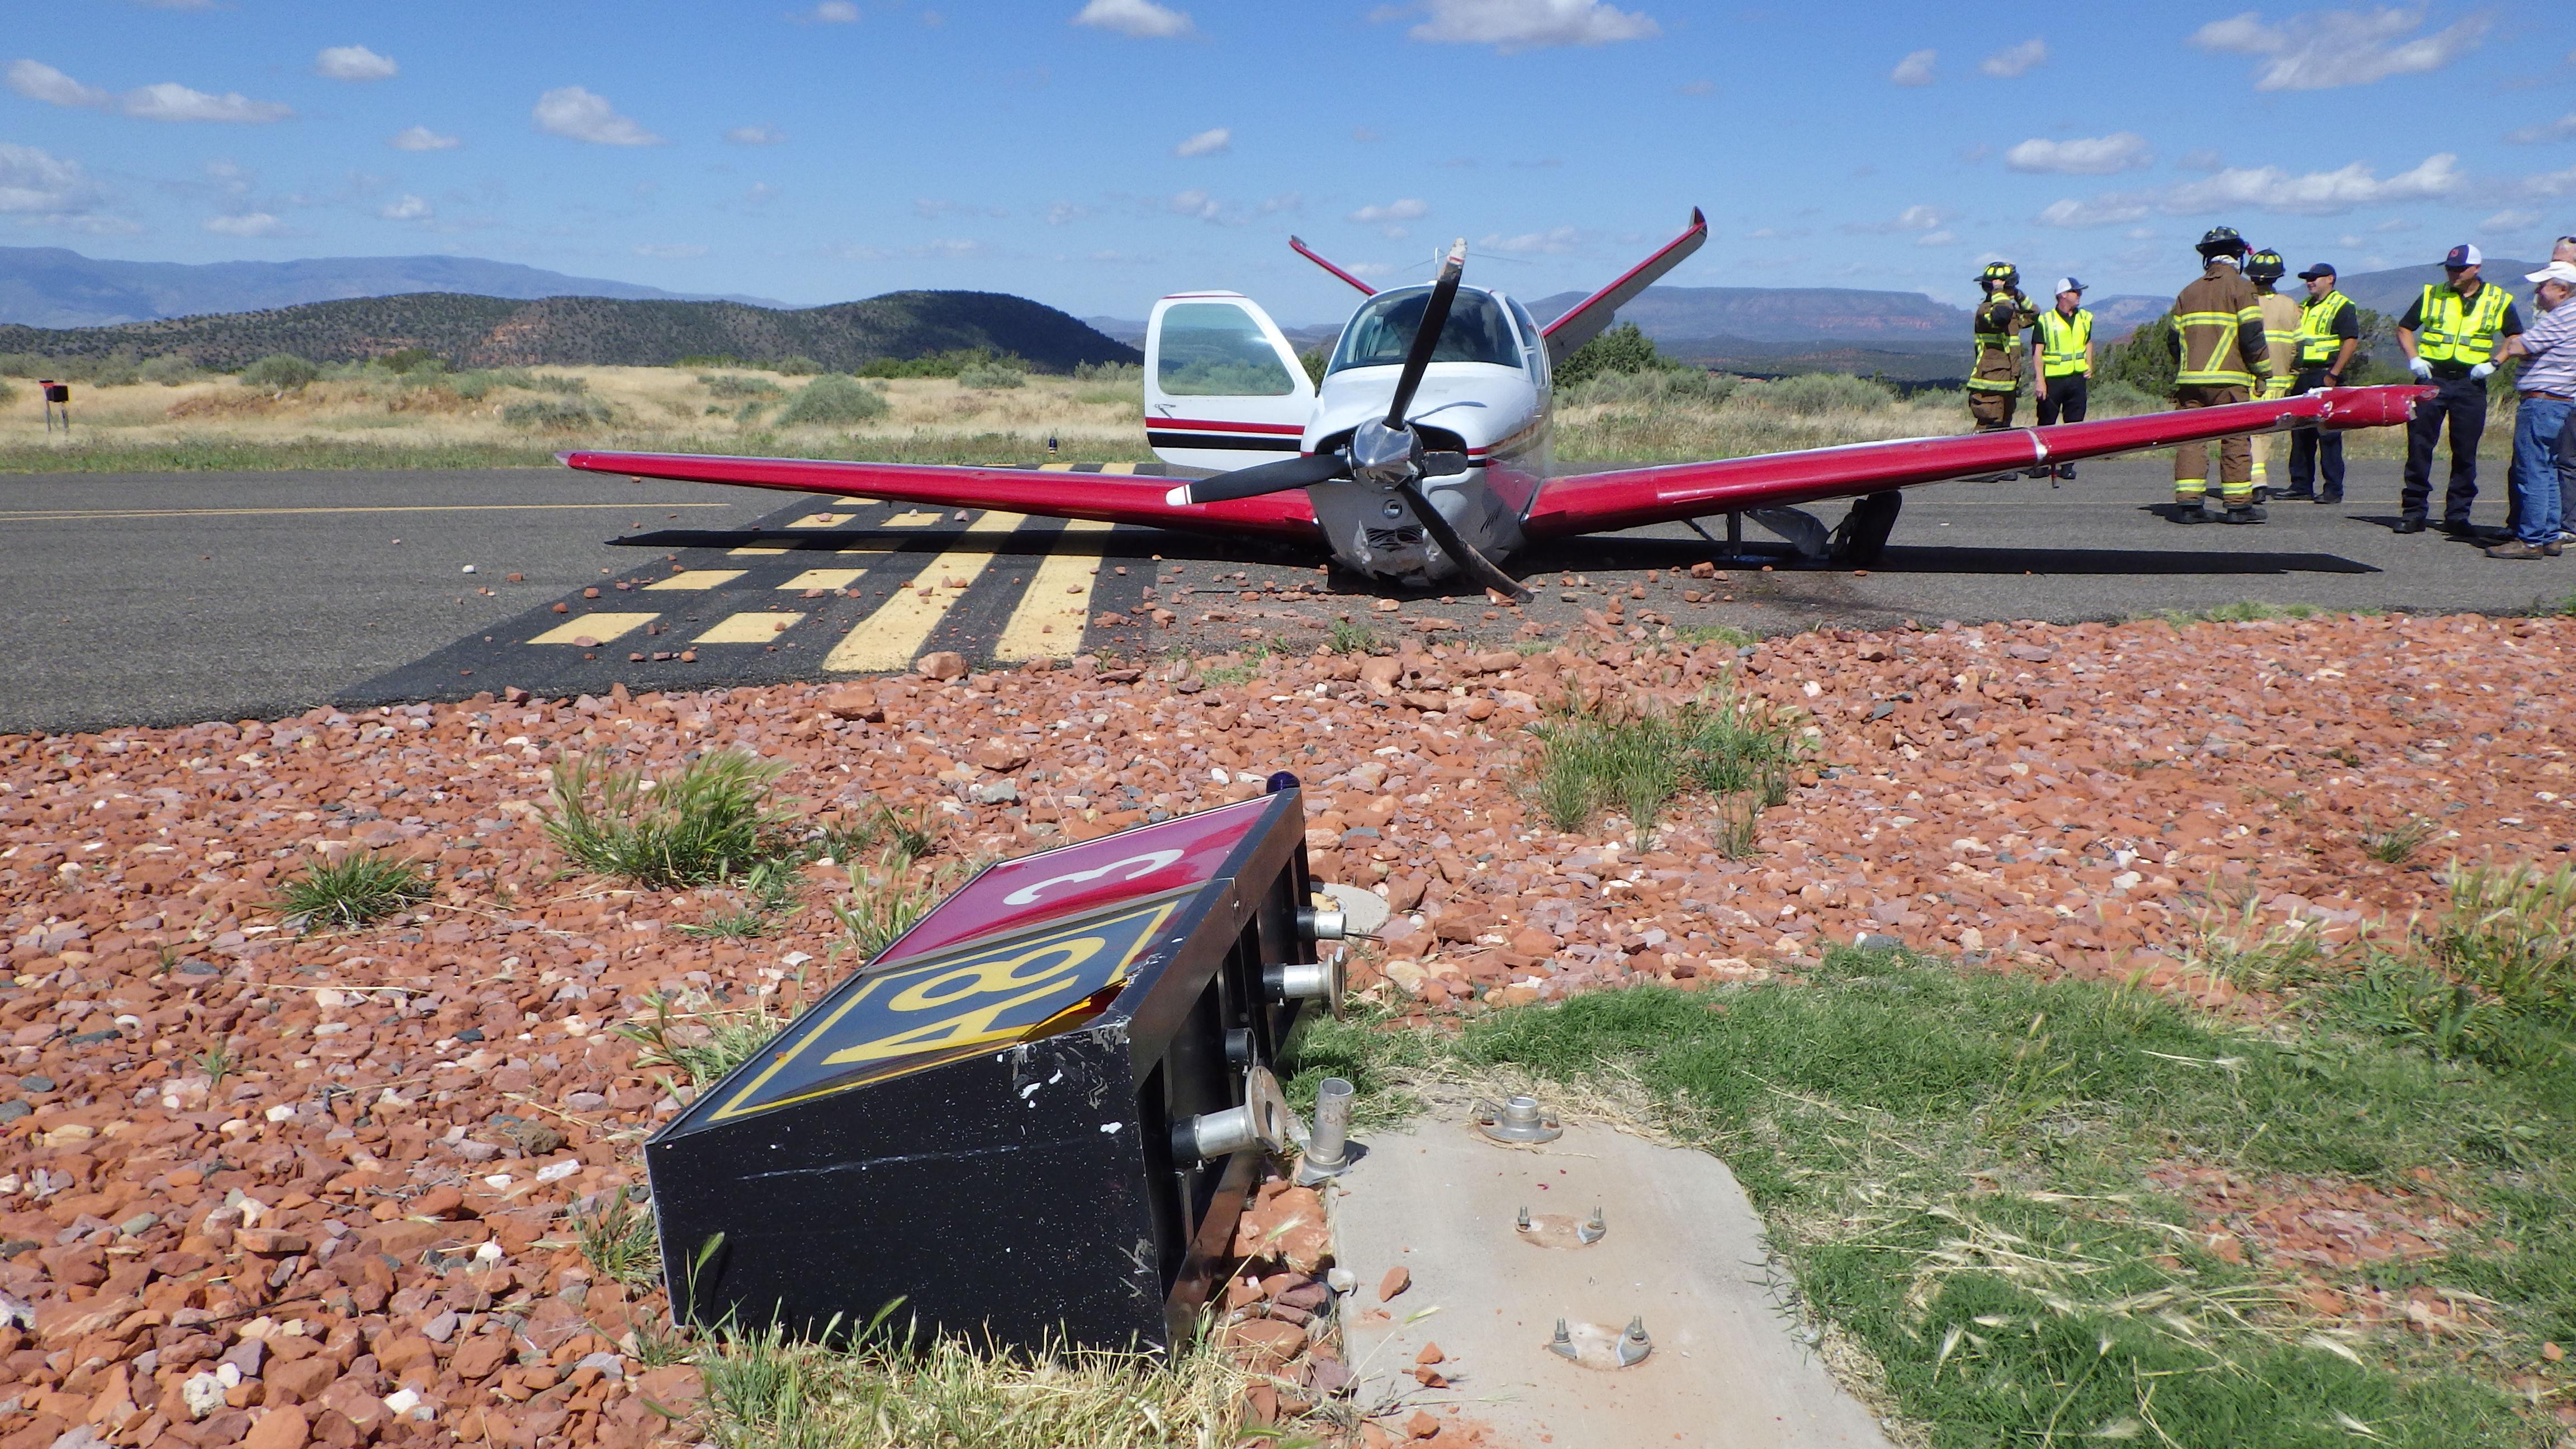 Airplane crashes at Sedona Airport